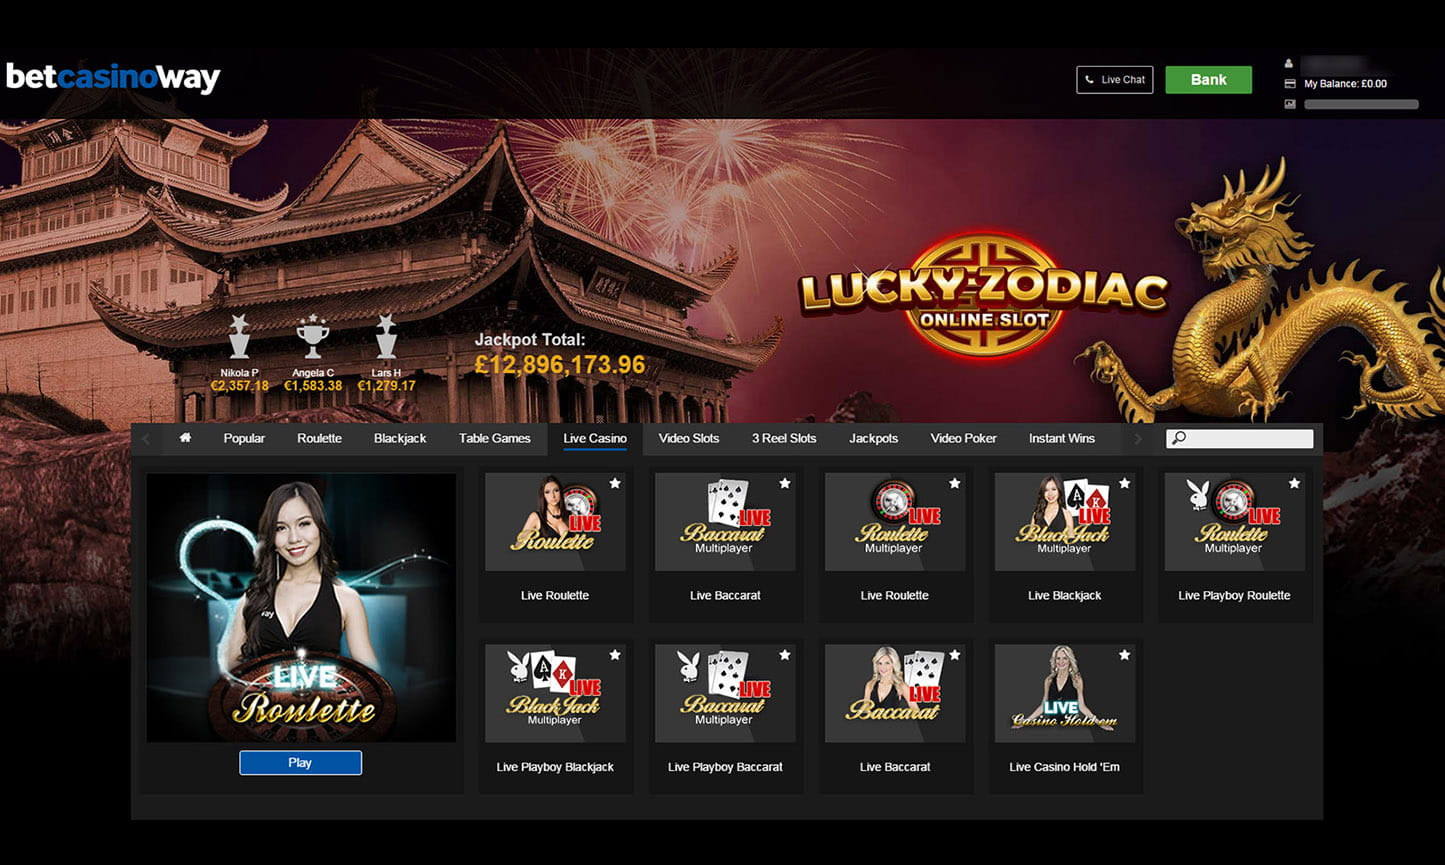 Storspelare välkomsterbjudande Betway casino Erotischemassage